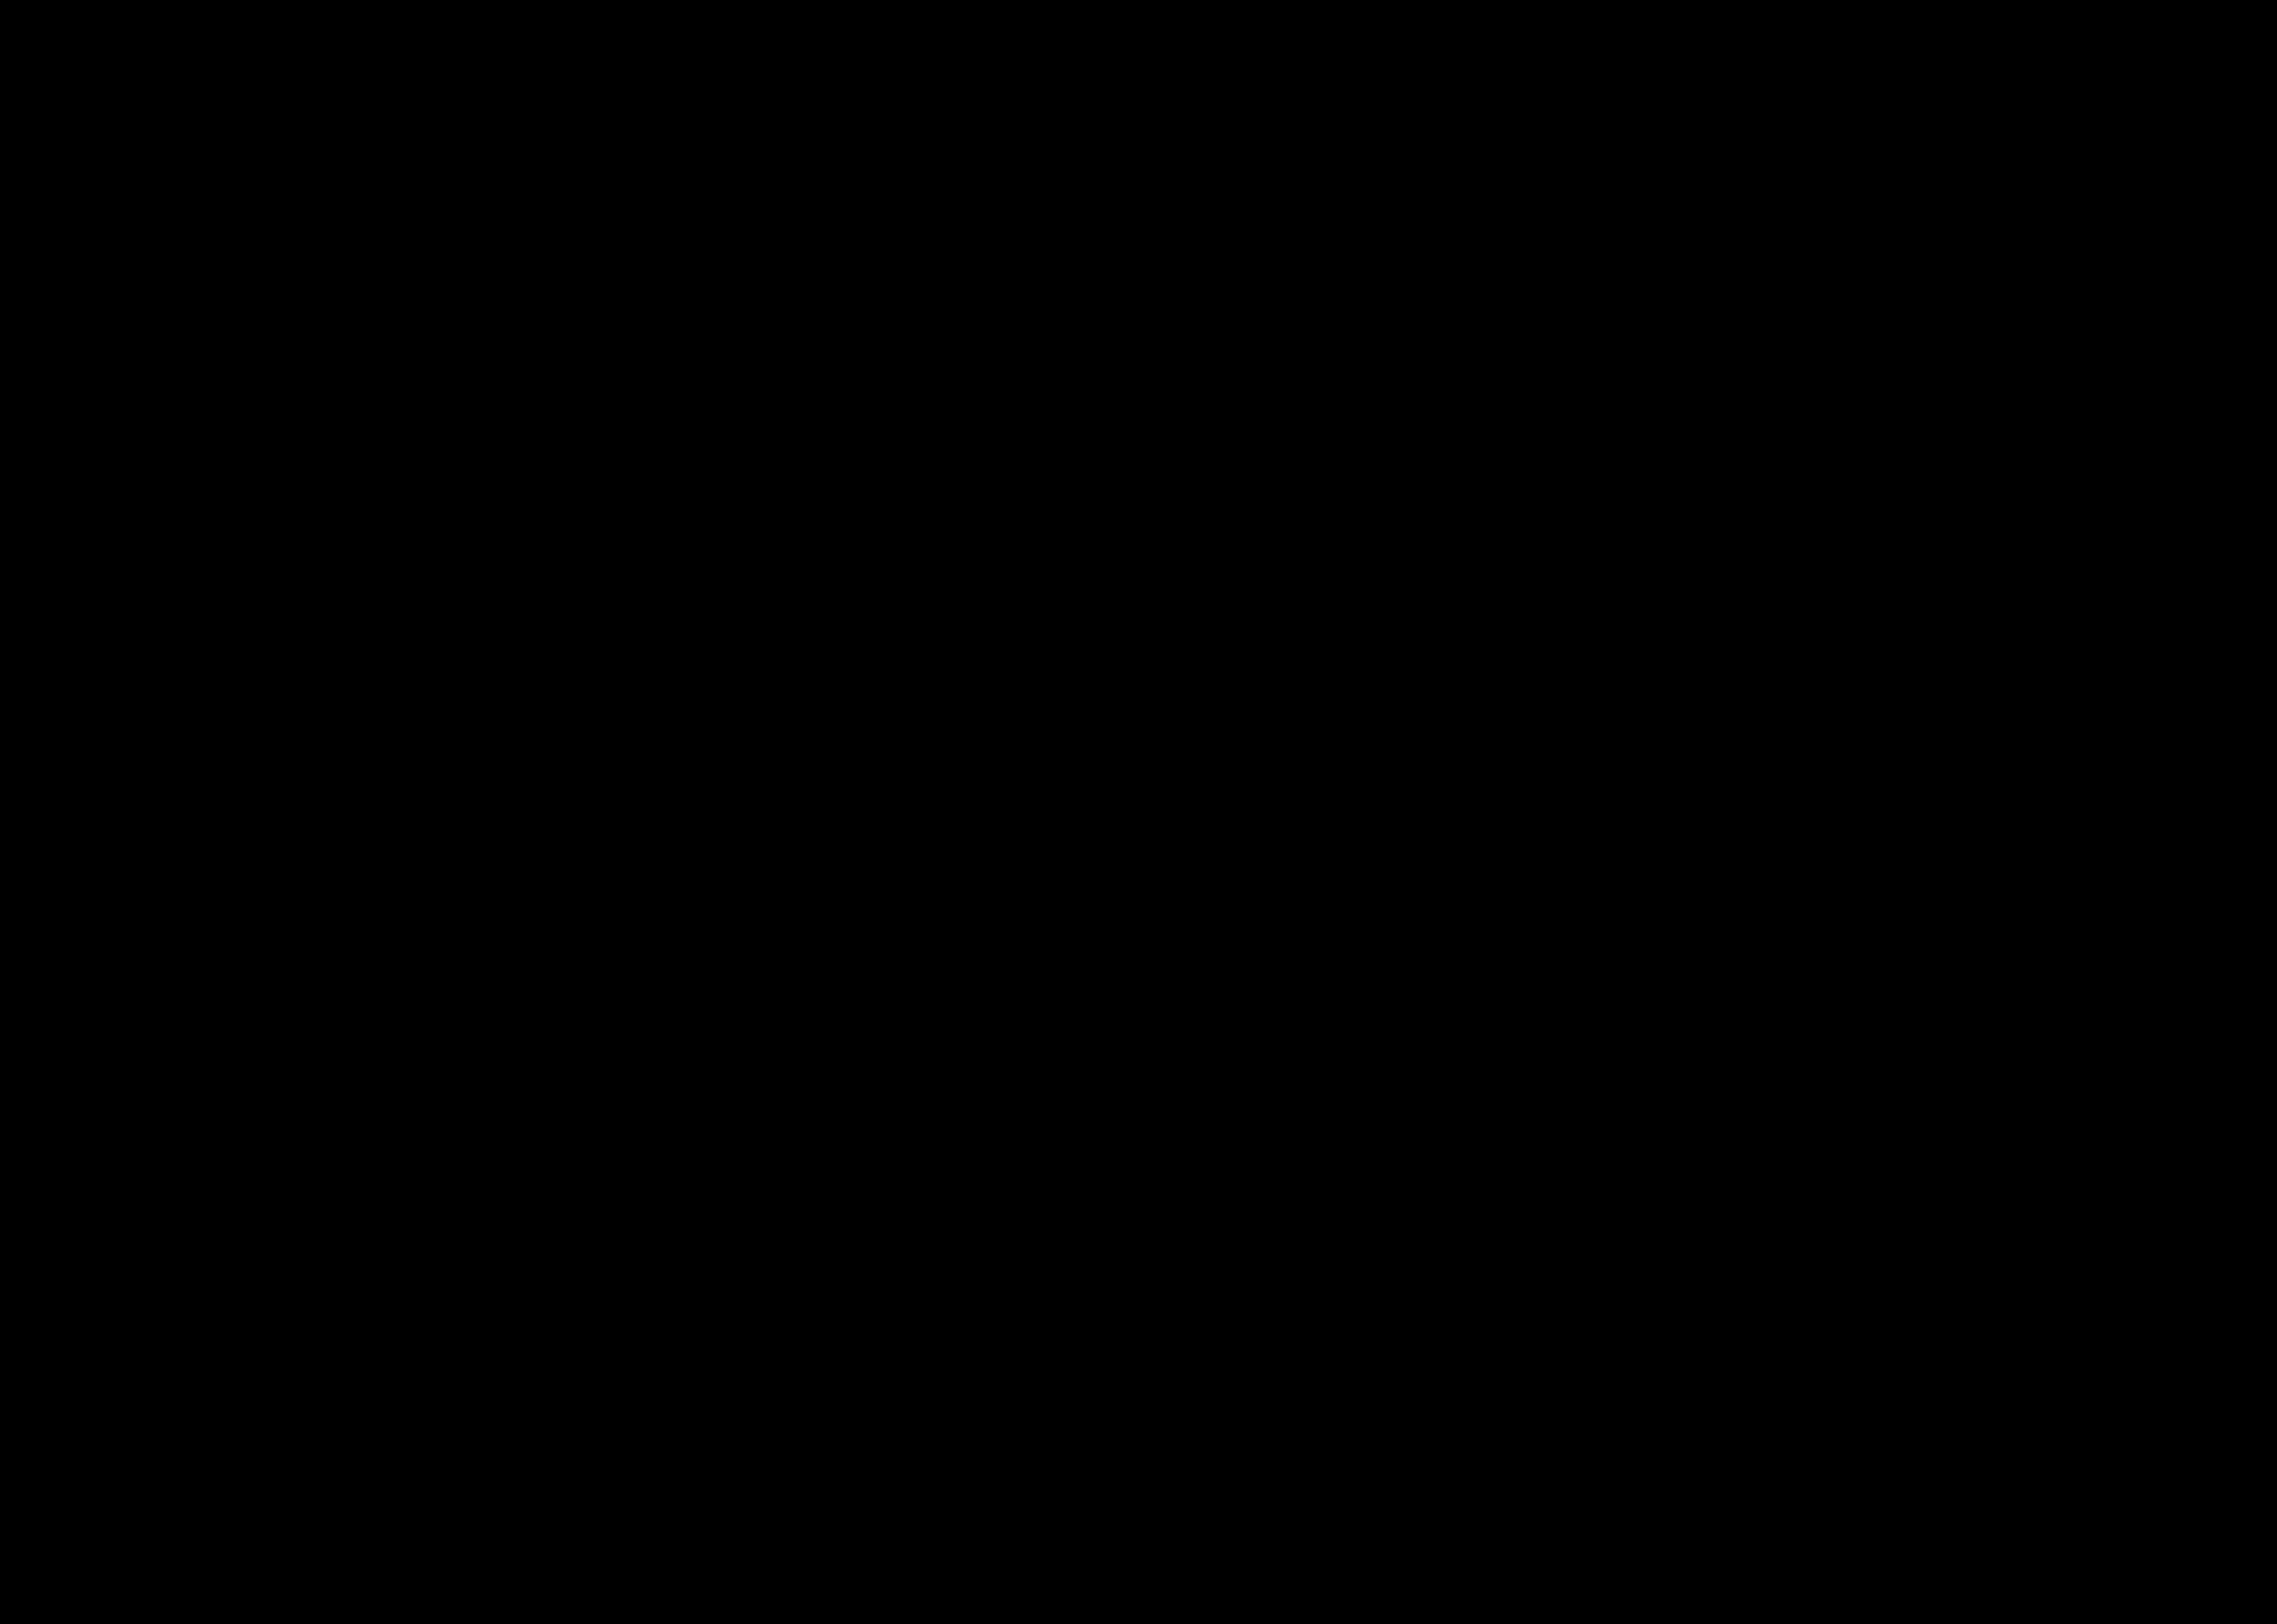 Pulsera Antelina Marrón Chico